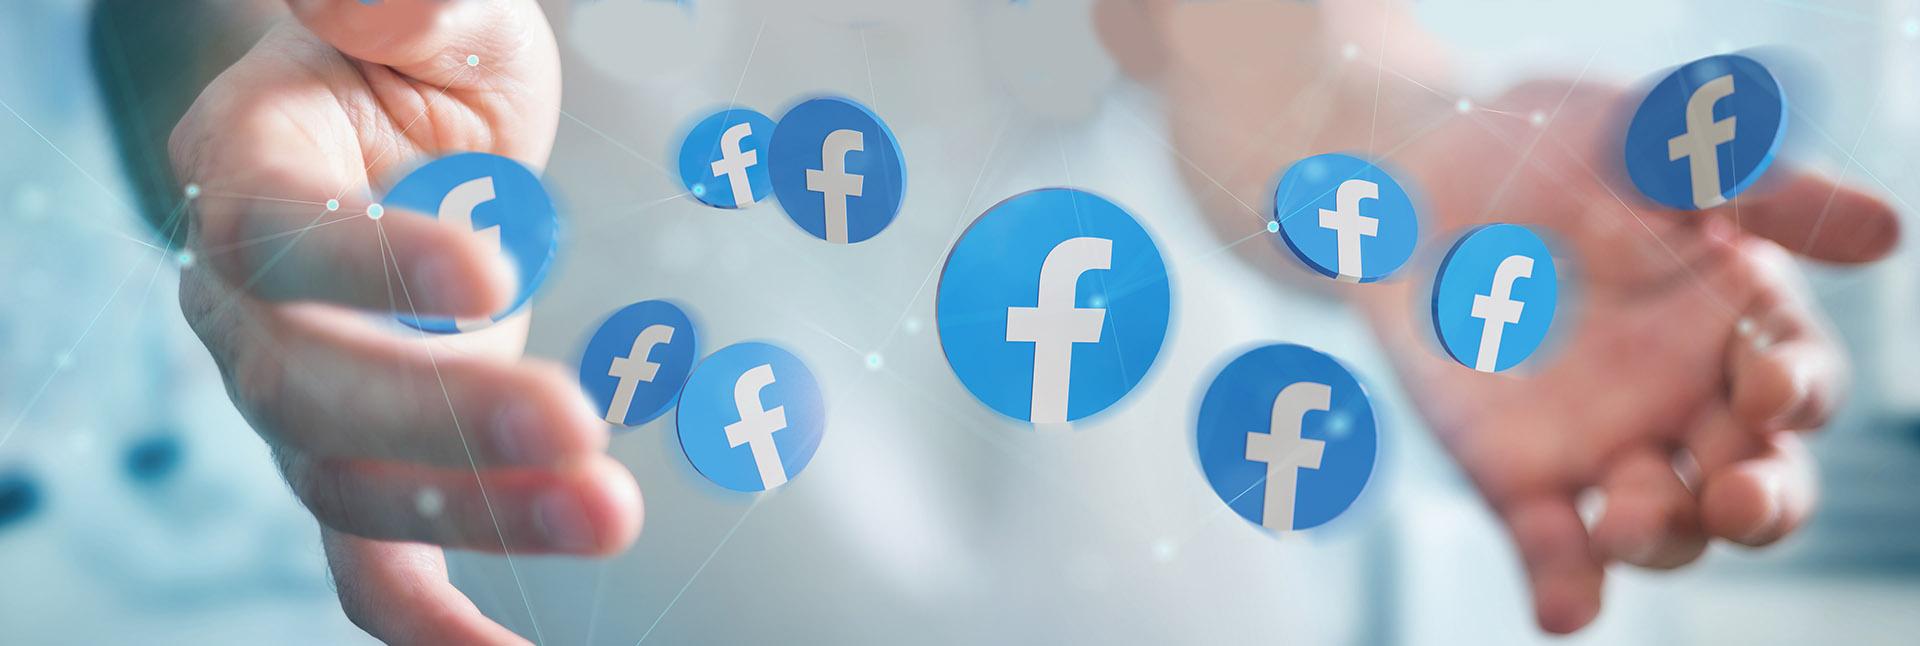 Facebook : ||des chiffres vertigineux !